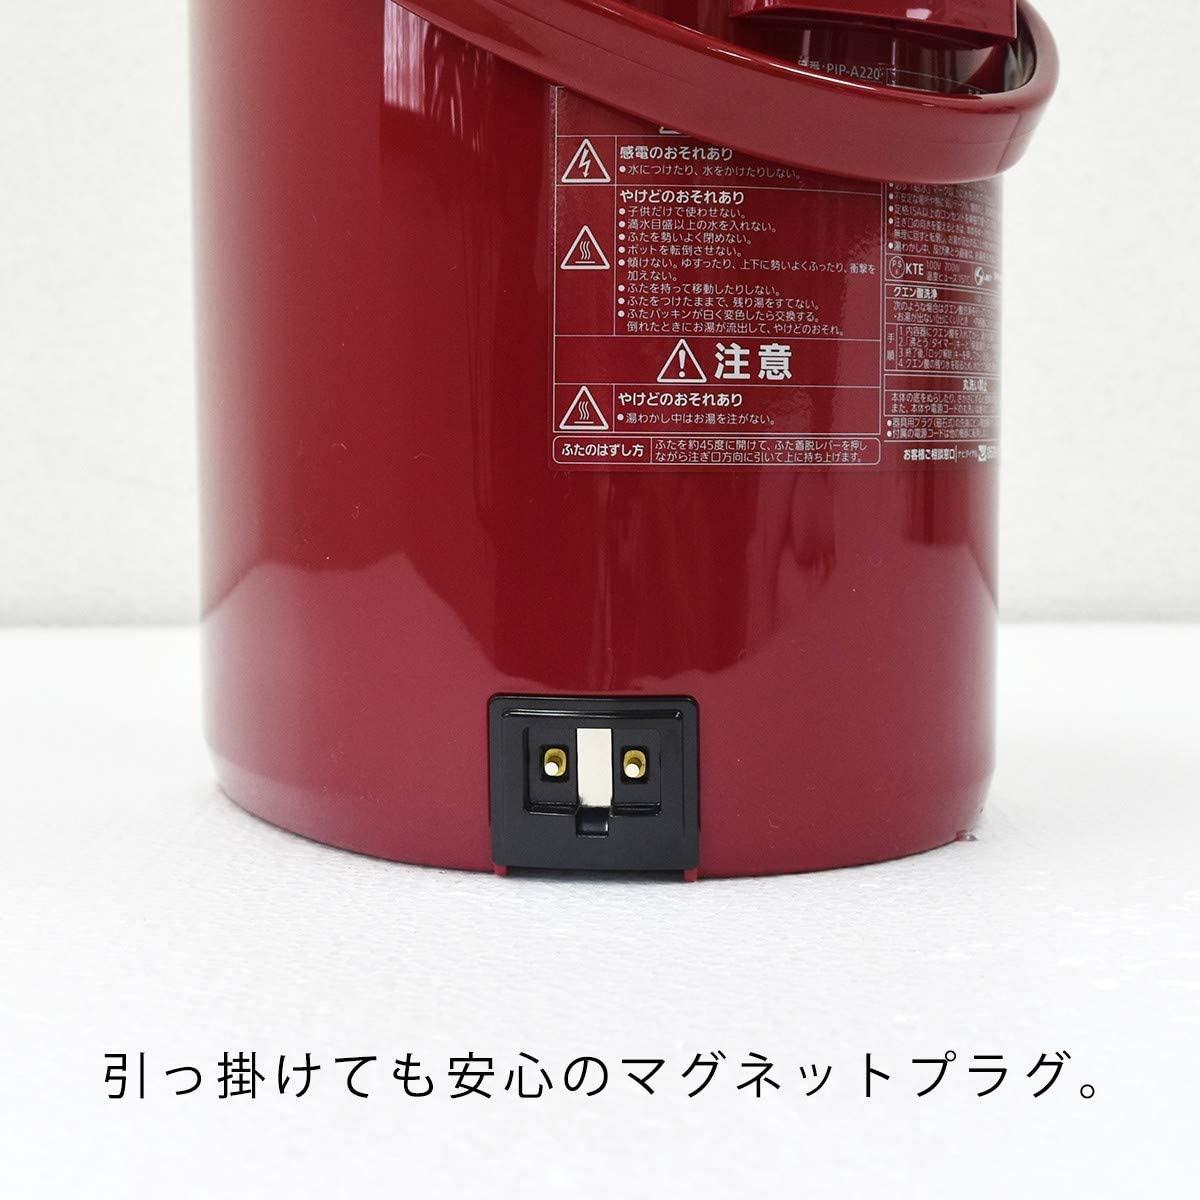 TIGER(タイガー)蒸気レスVE電気まほうびん PIP-A300の商品画像8